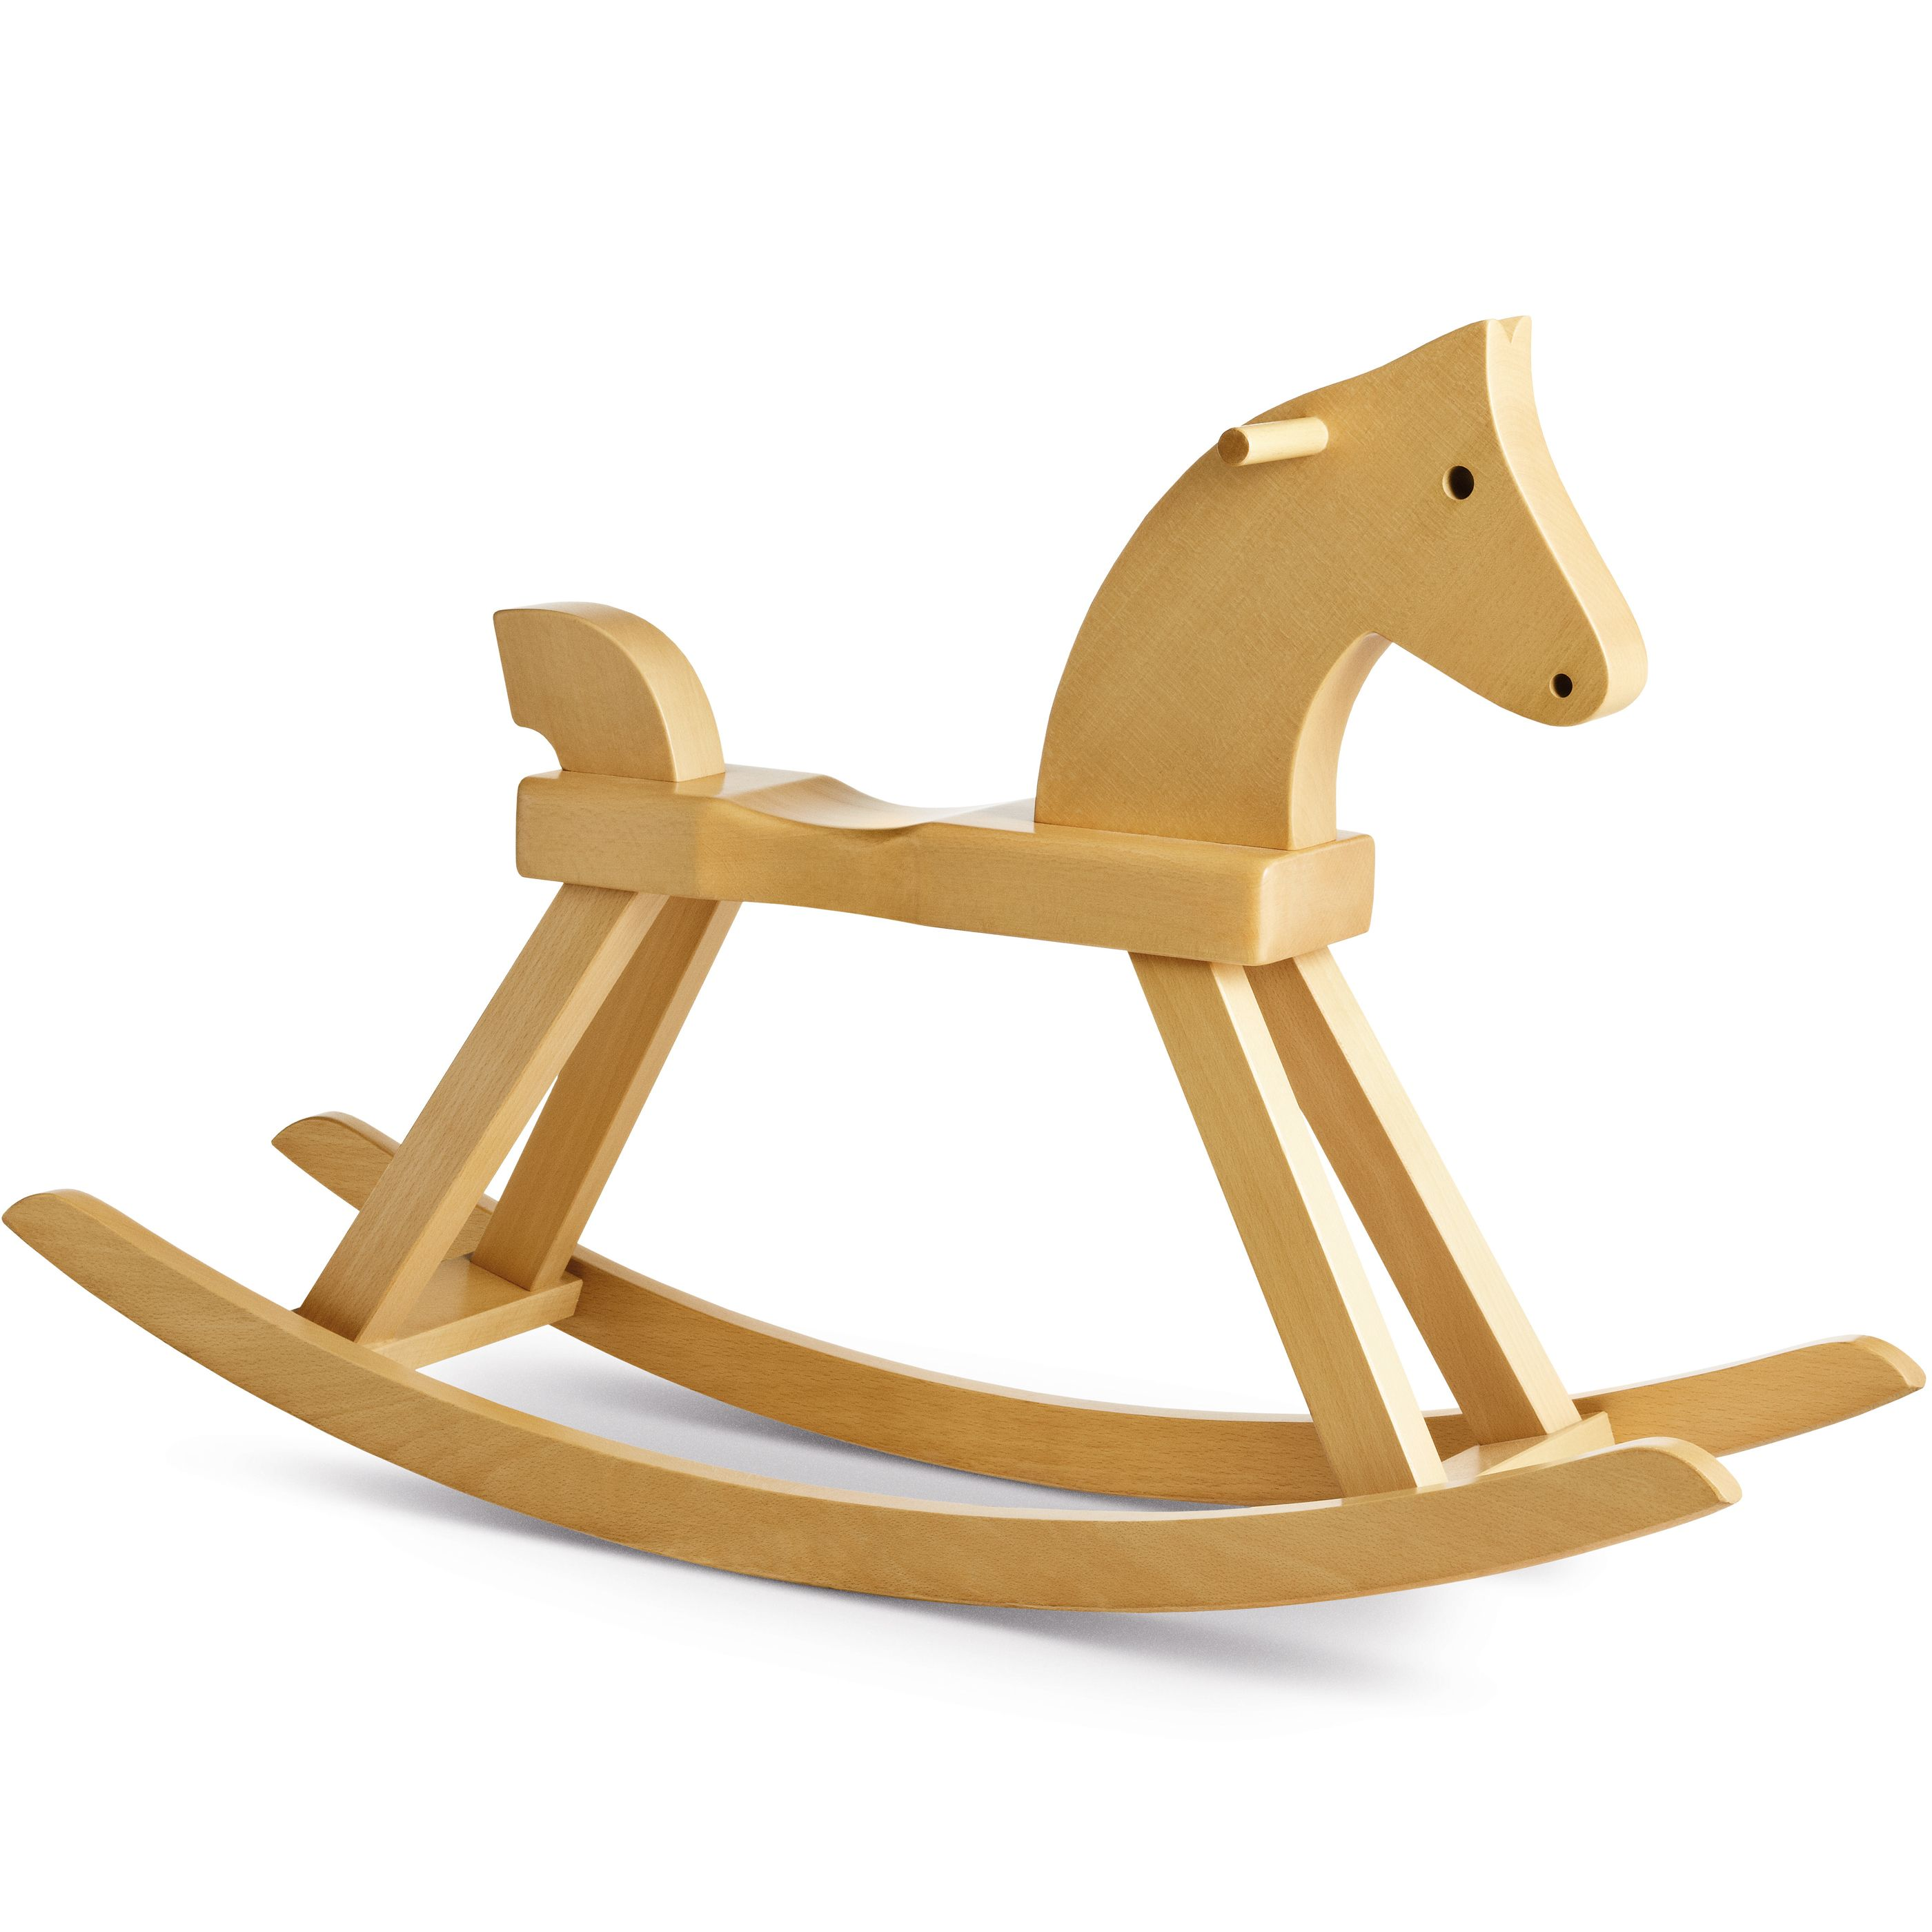 Kay Bojesen Rocking Horse schommelpaard kopen